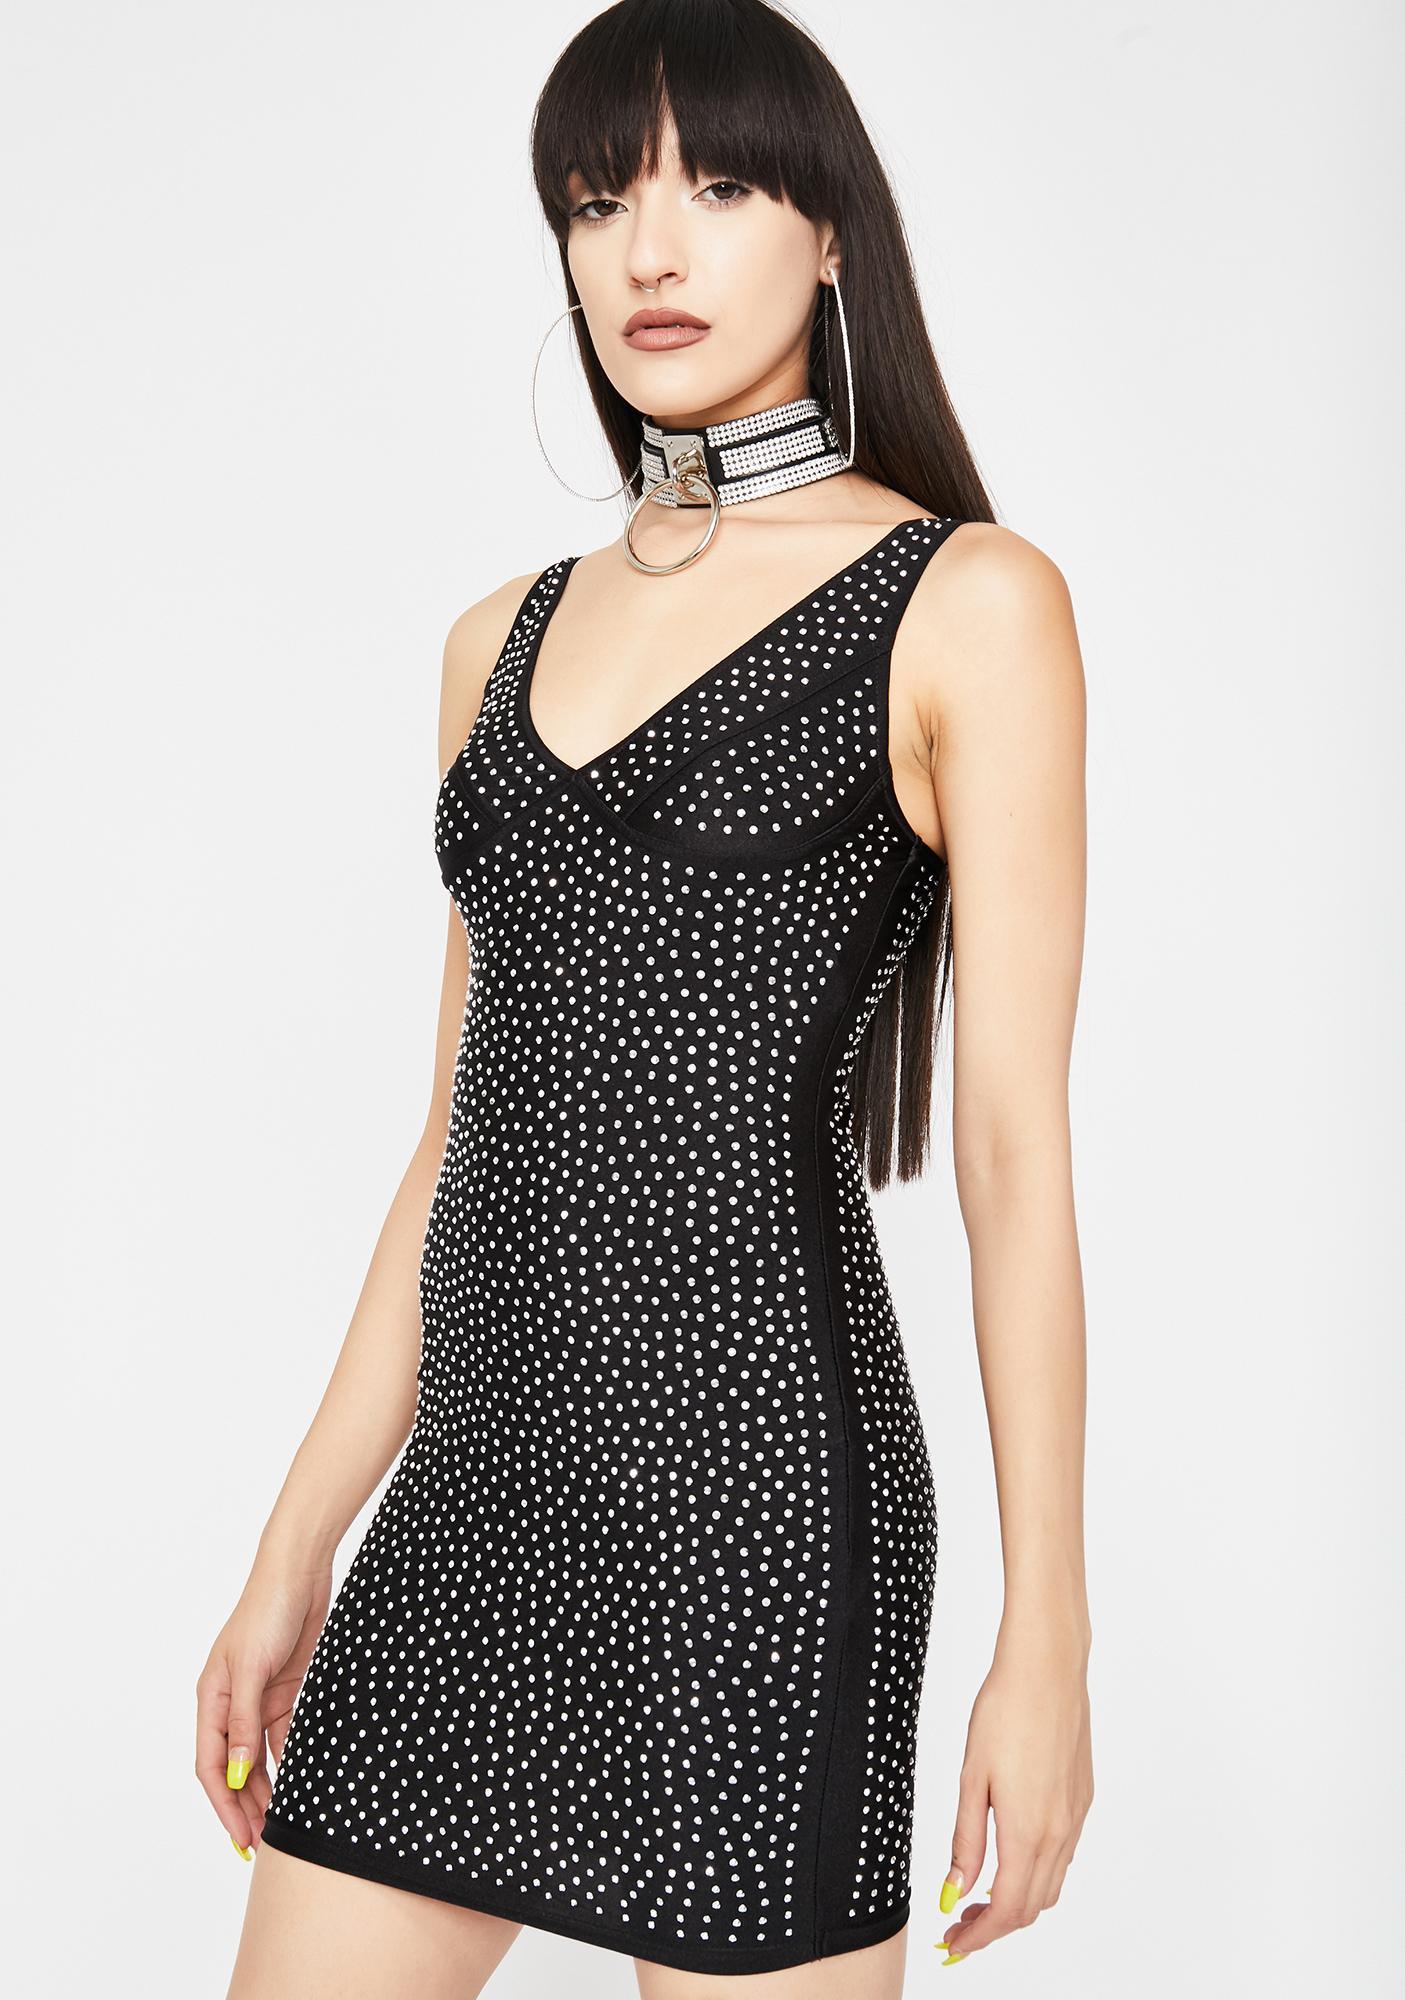 Night Galactic Glare Rhinestone Dress